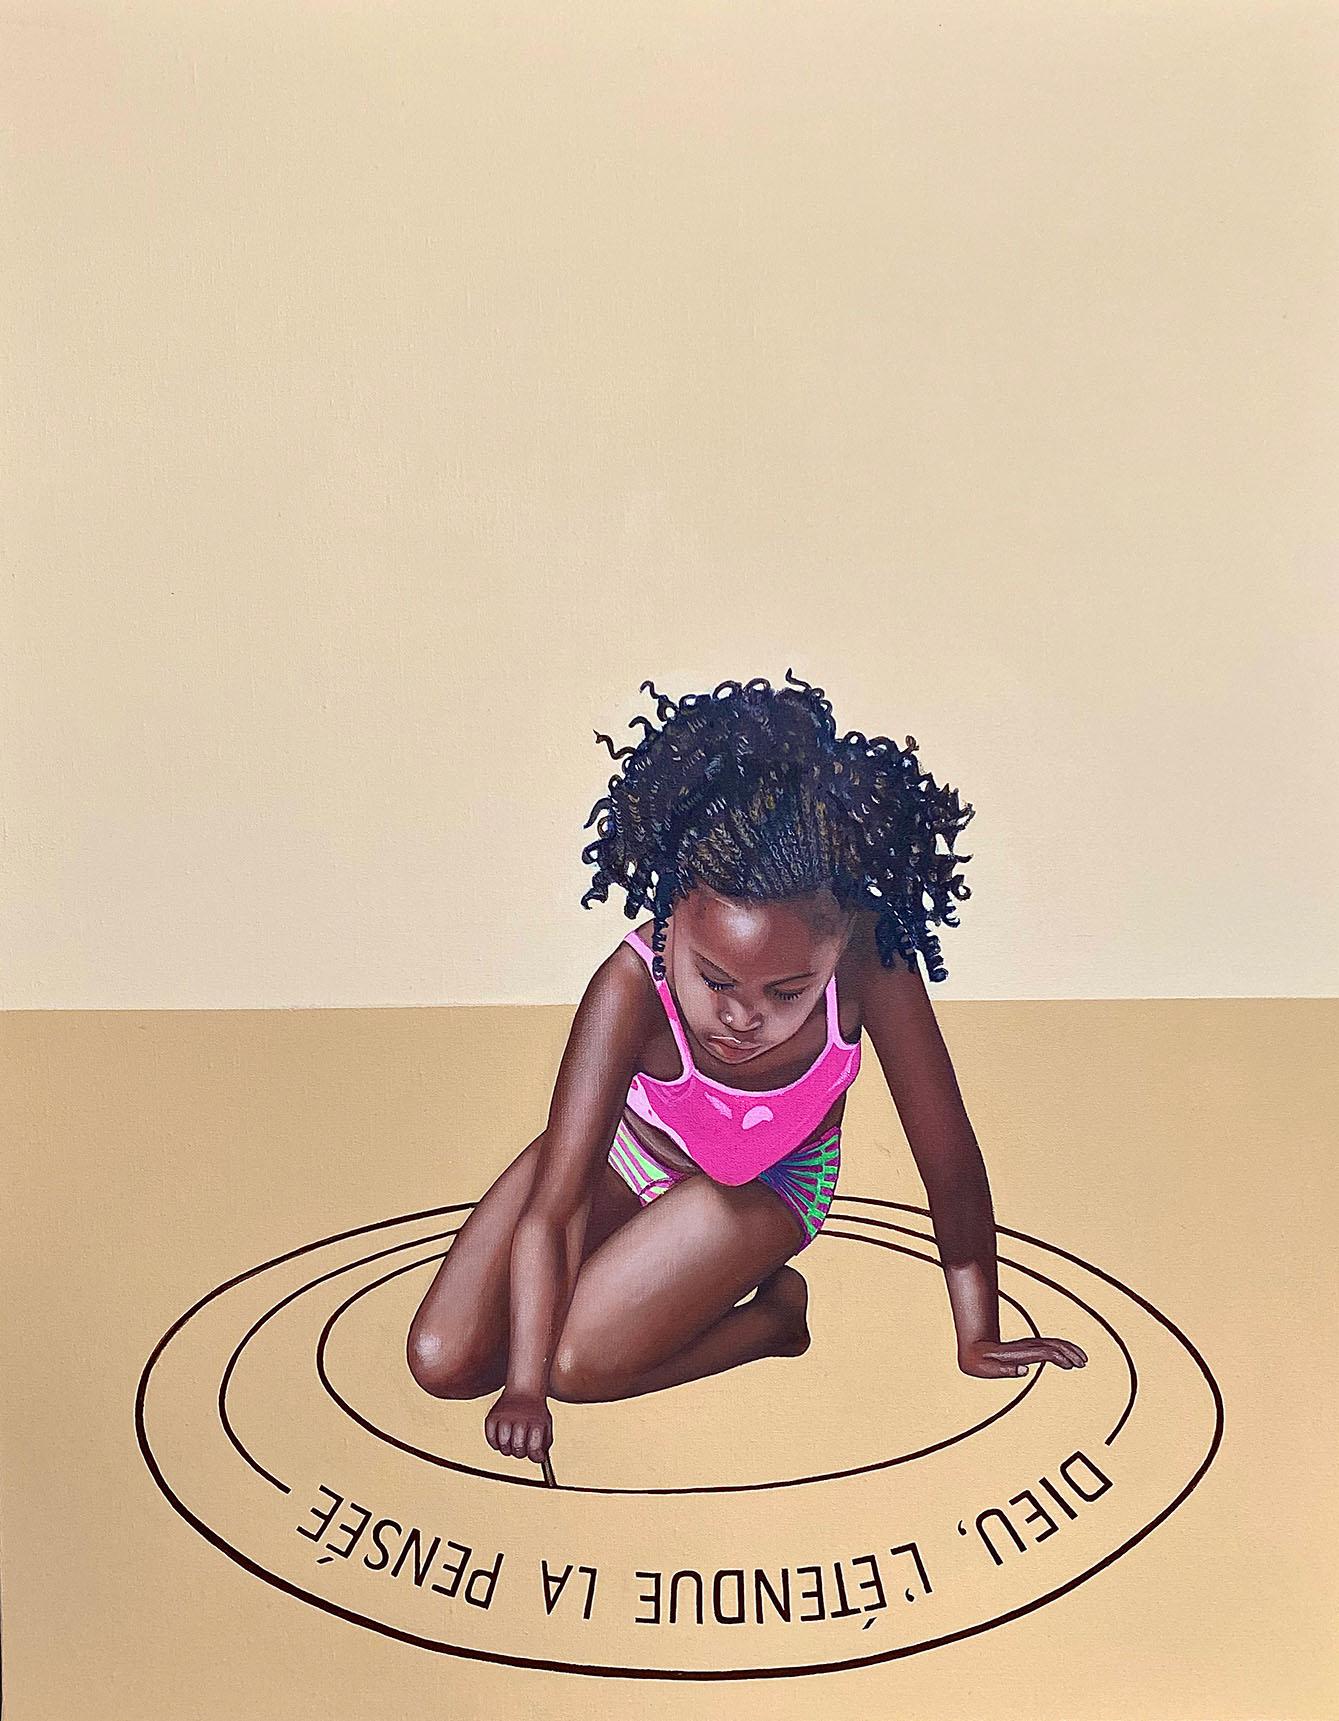 Cristina Ruiz Guinazu, Dieu, l'étendue, la pensée, acrylics on canvas, 92 x 73 cm, 2019